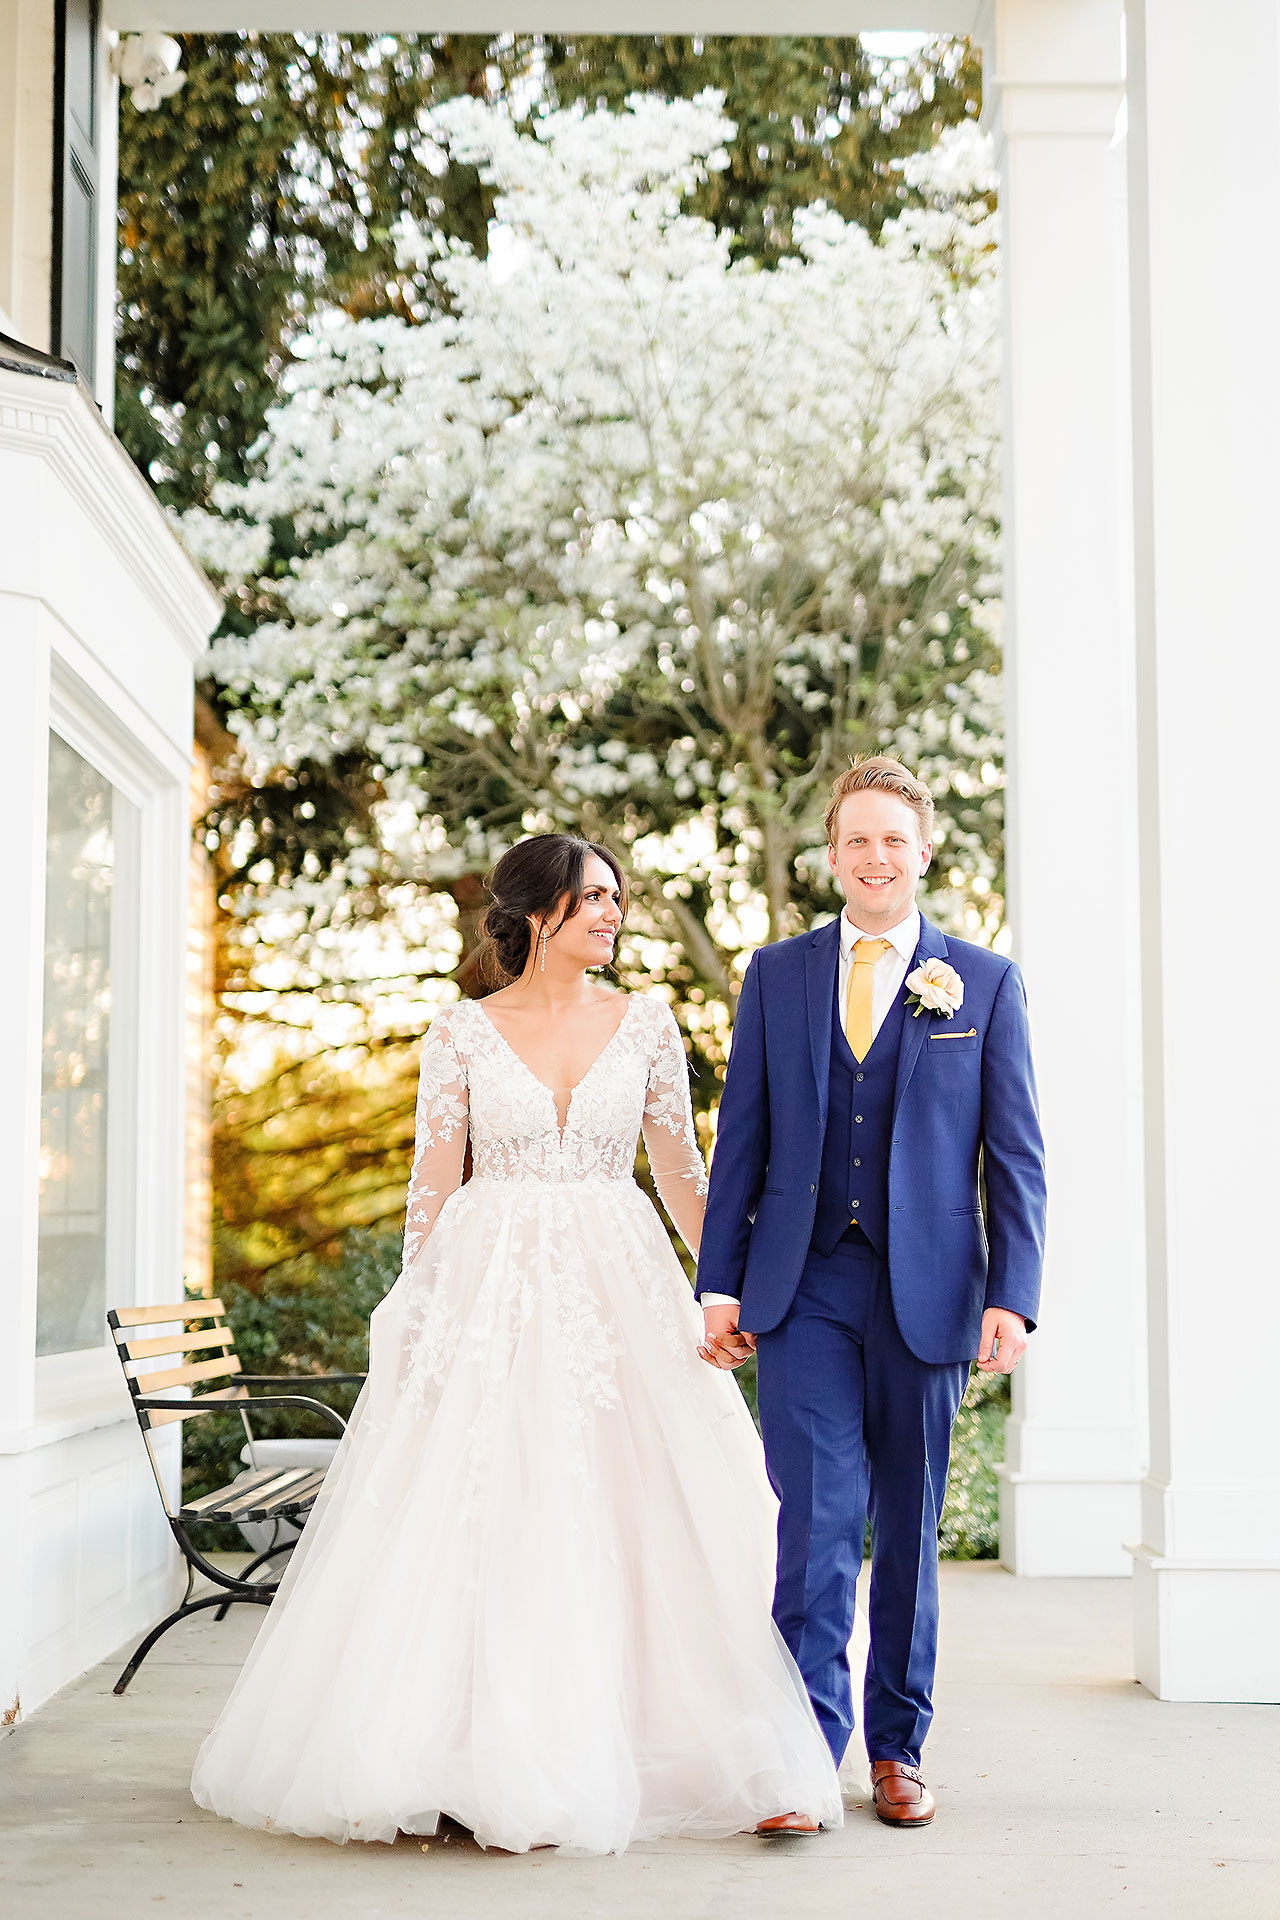 Nadia Parker Black Iris Estate Carmel Indiana Wedding May 2021 264